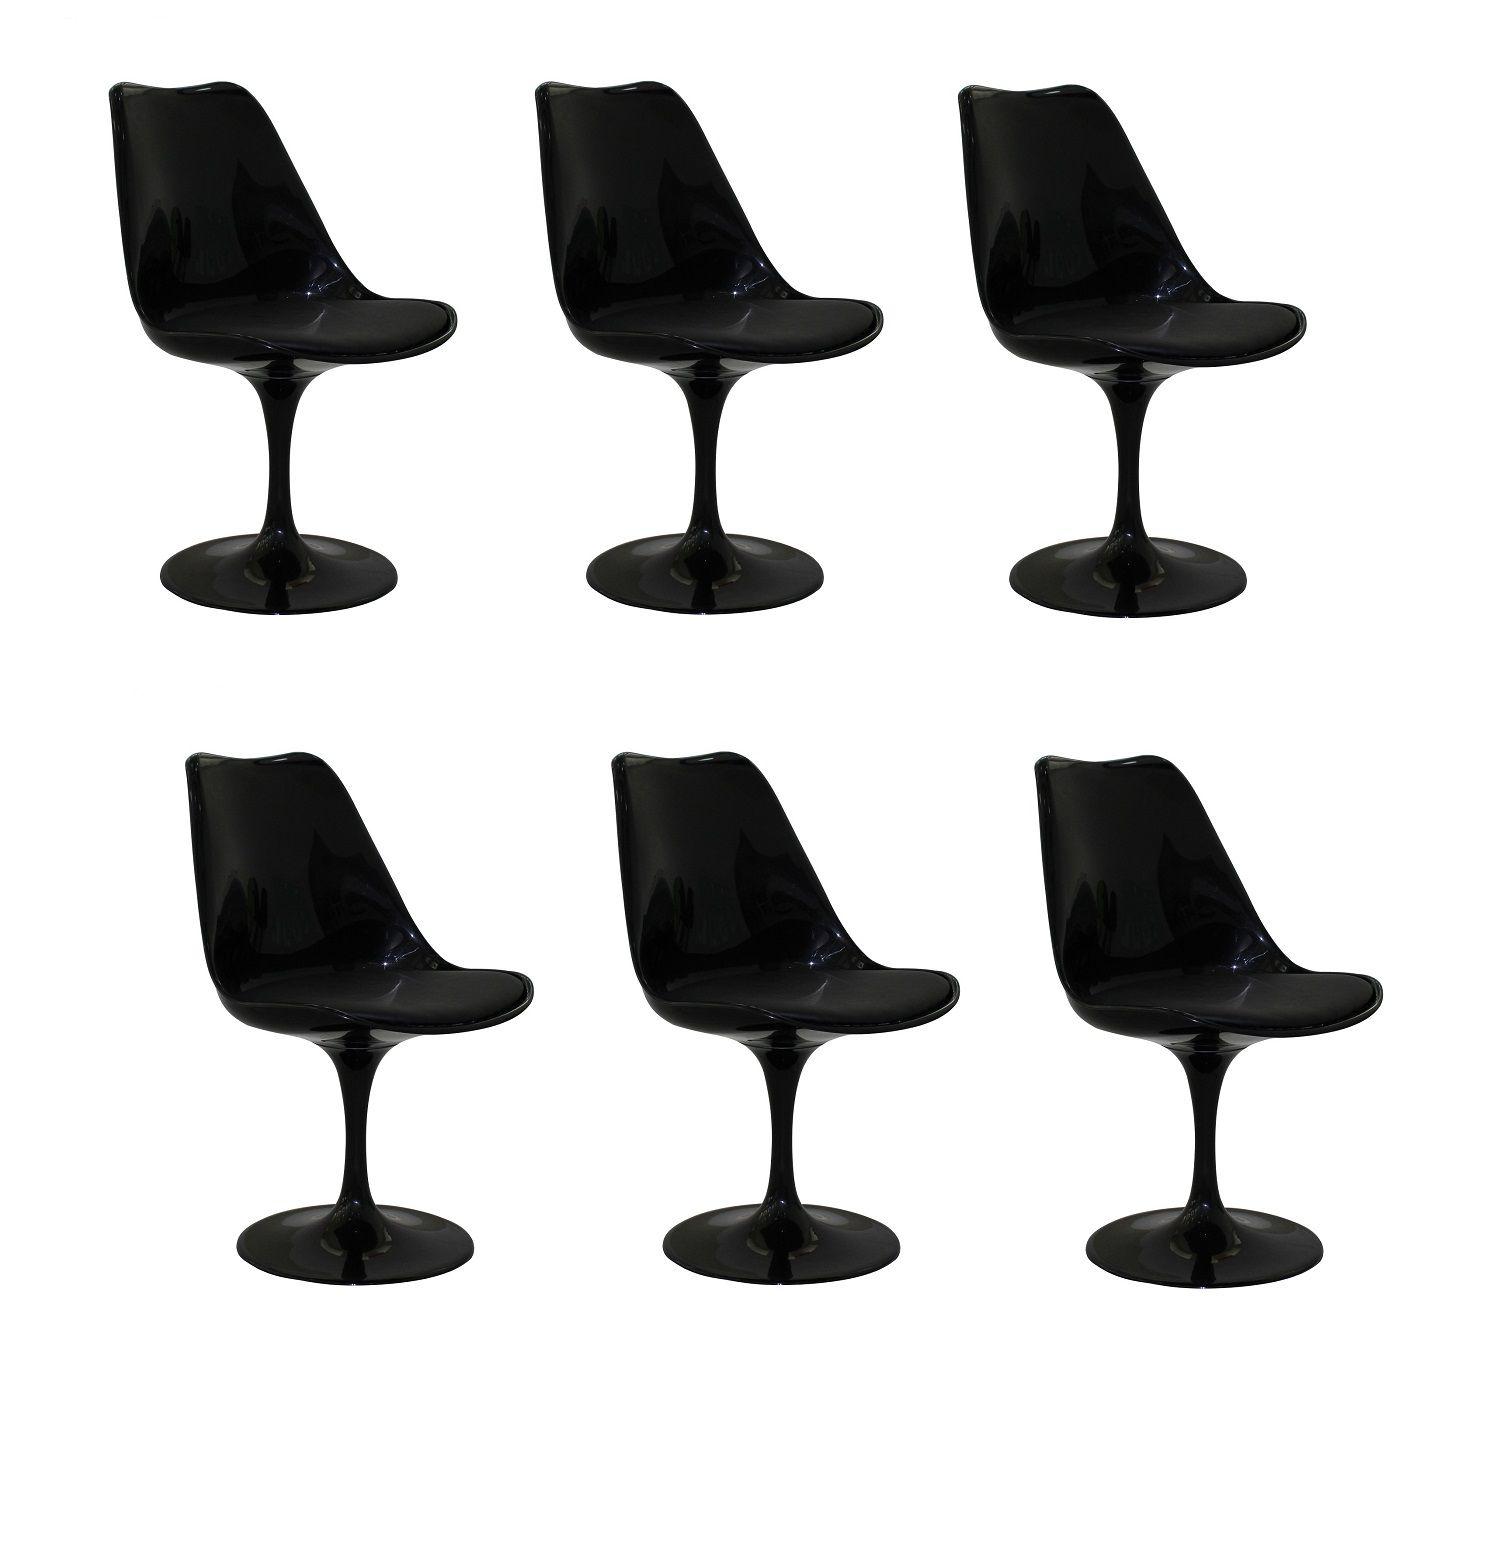 Kit 6 Cadeiras Design Saarinen Pelegrin PEL-1855H Giratória Preta em ABS